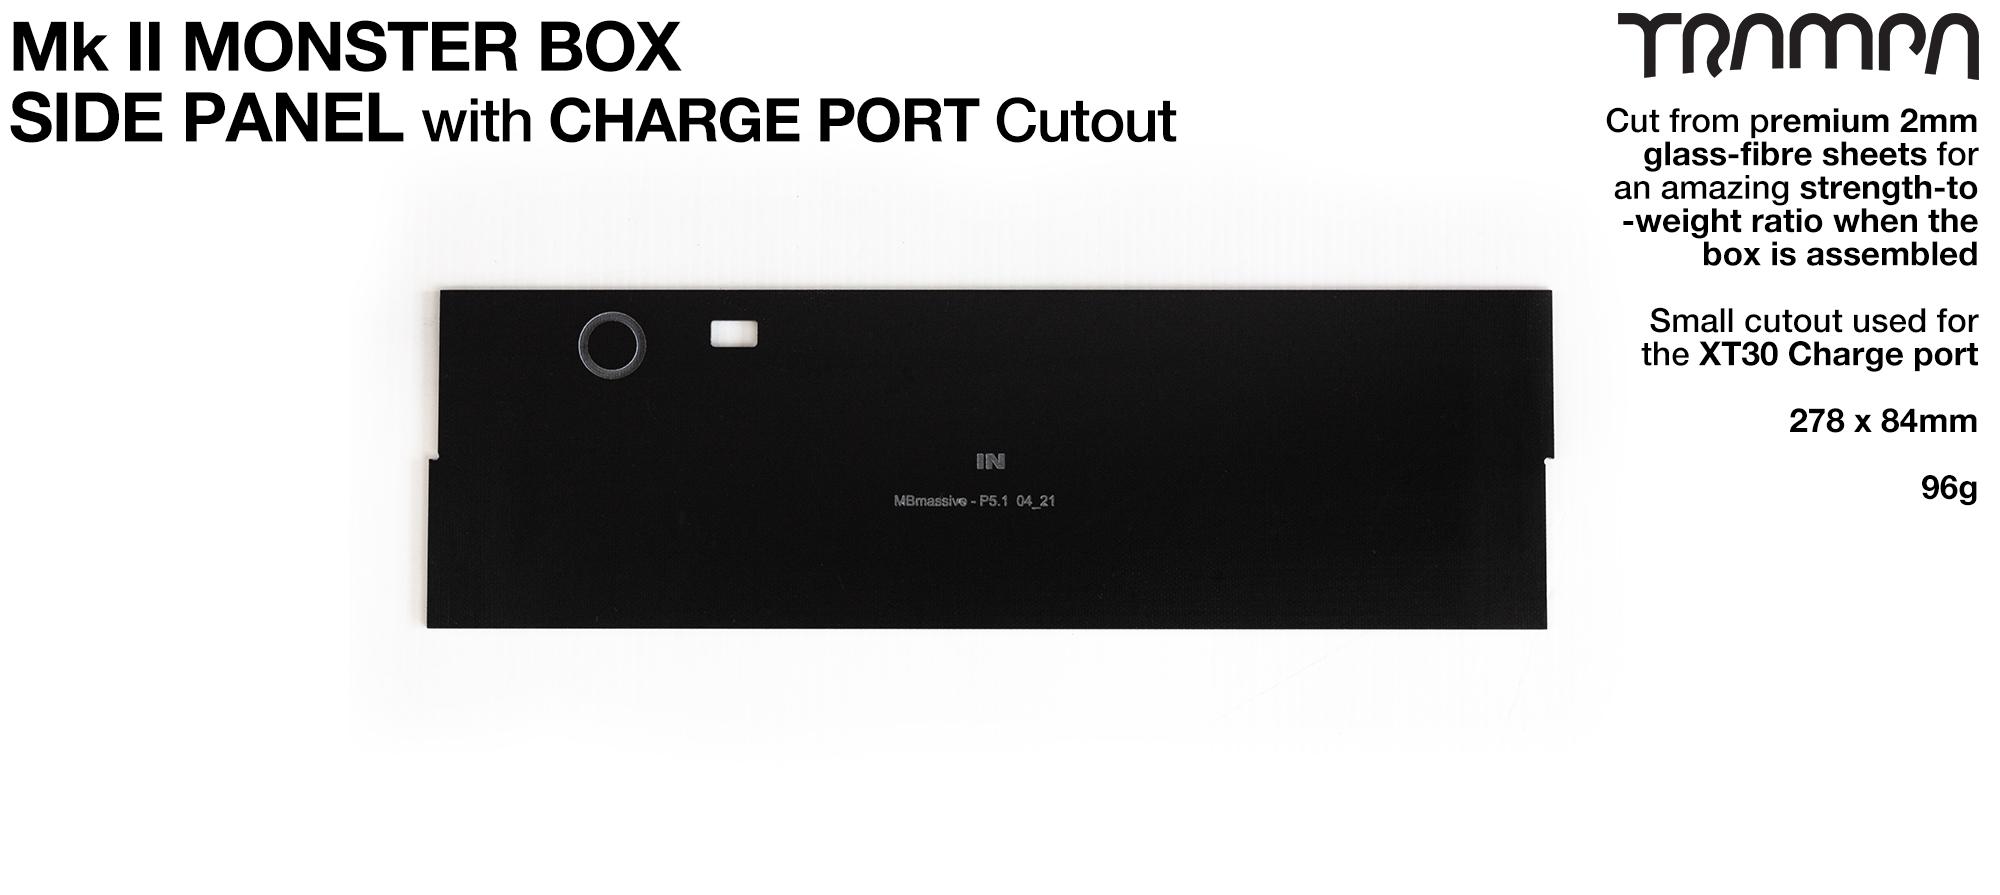 MASSIVE Monster Box SIDE PANEL - CHARGER